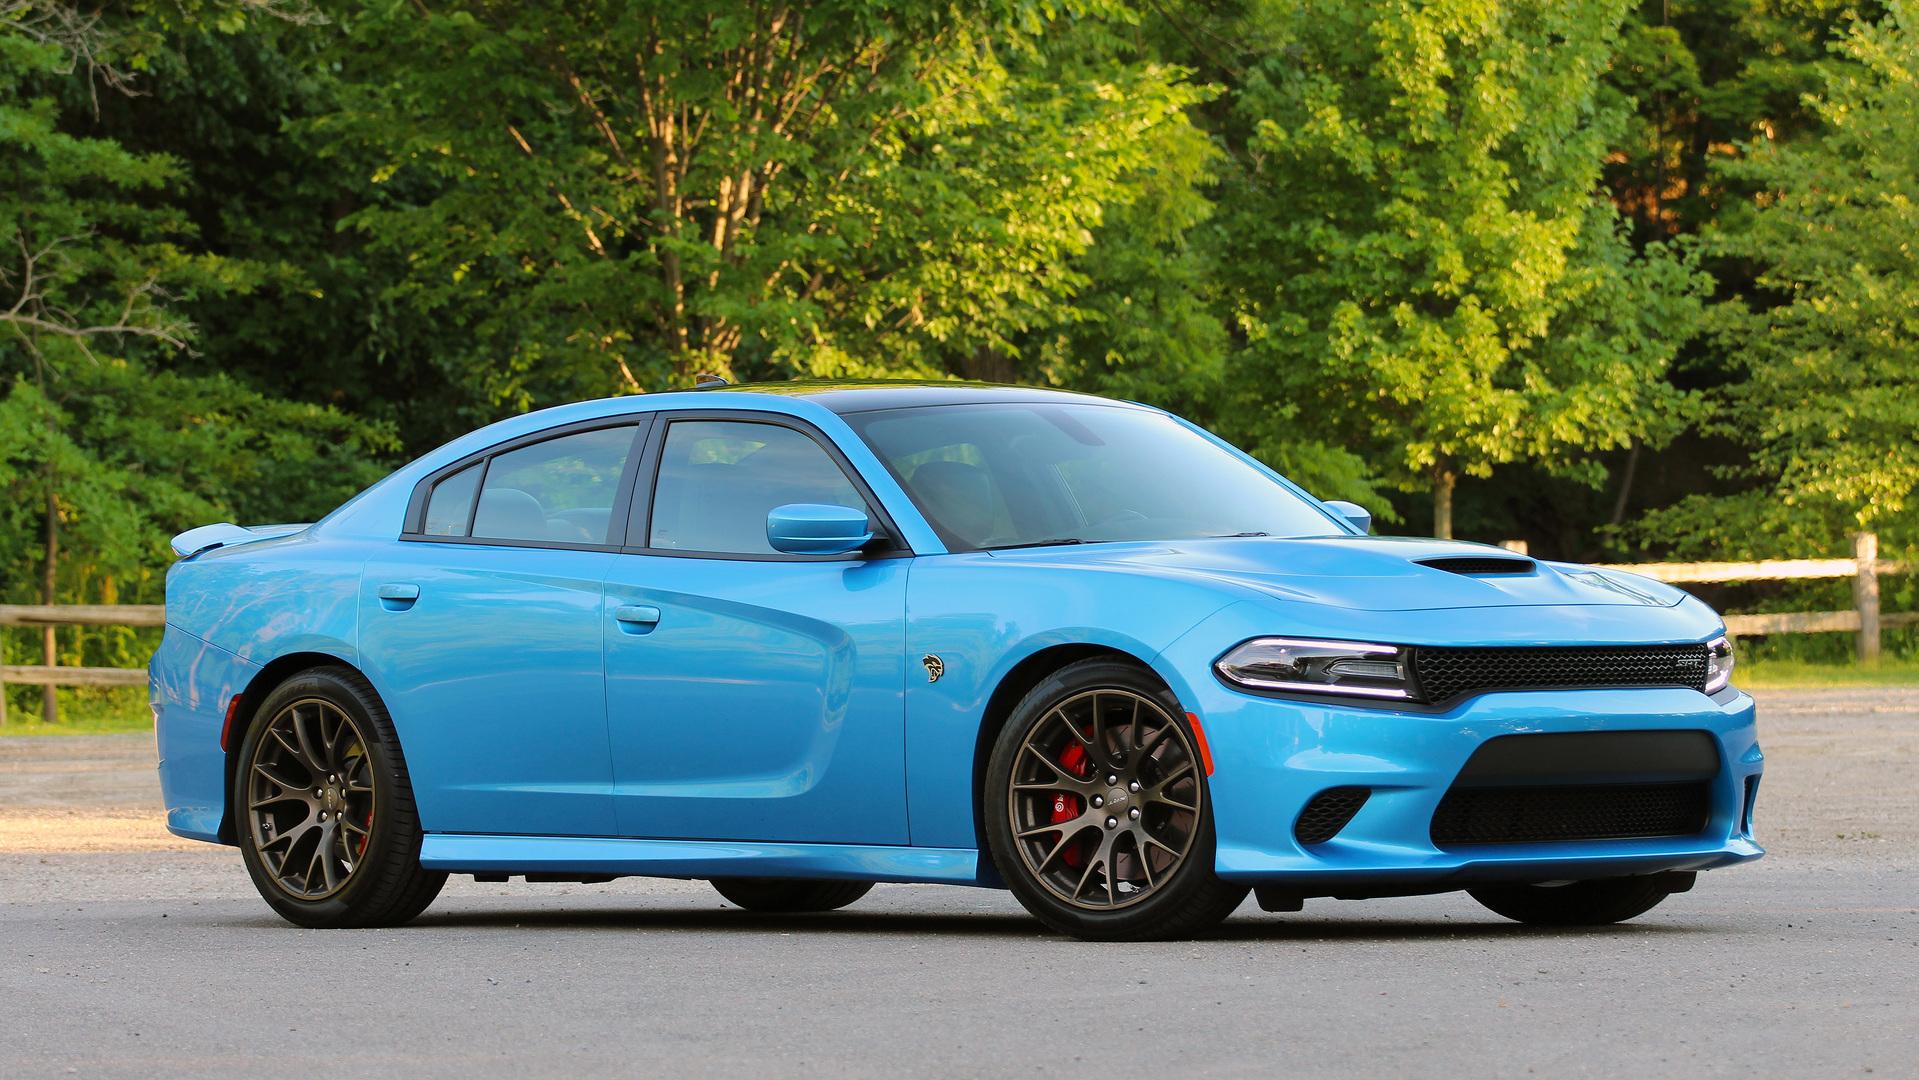 Dodge Charger Srt >> Review: 2016 Dodge Charger SRT Hellcat